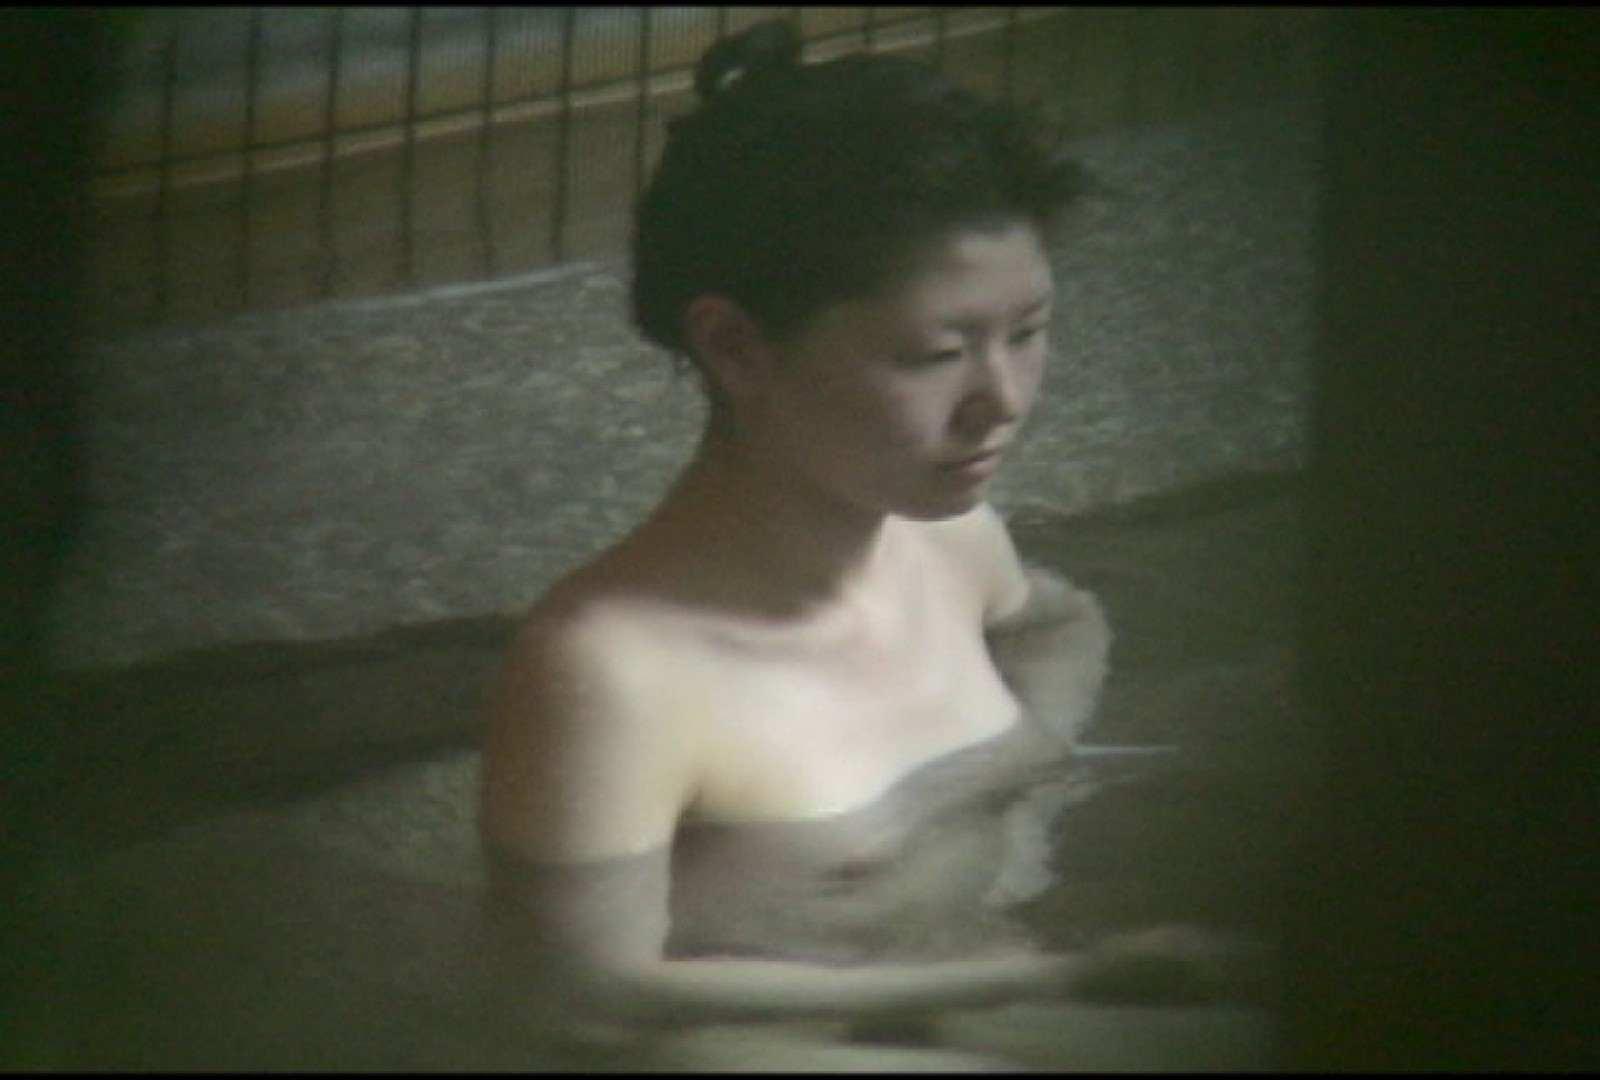 Aquaな露天風呂Vol.699 露天風呂 | OLのエロ生活  104連発 40